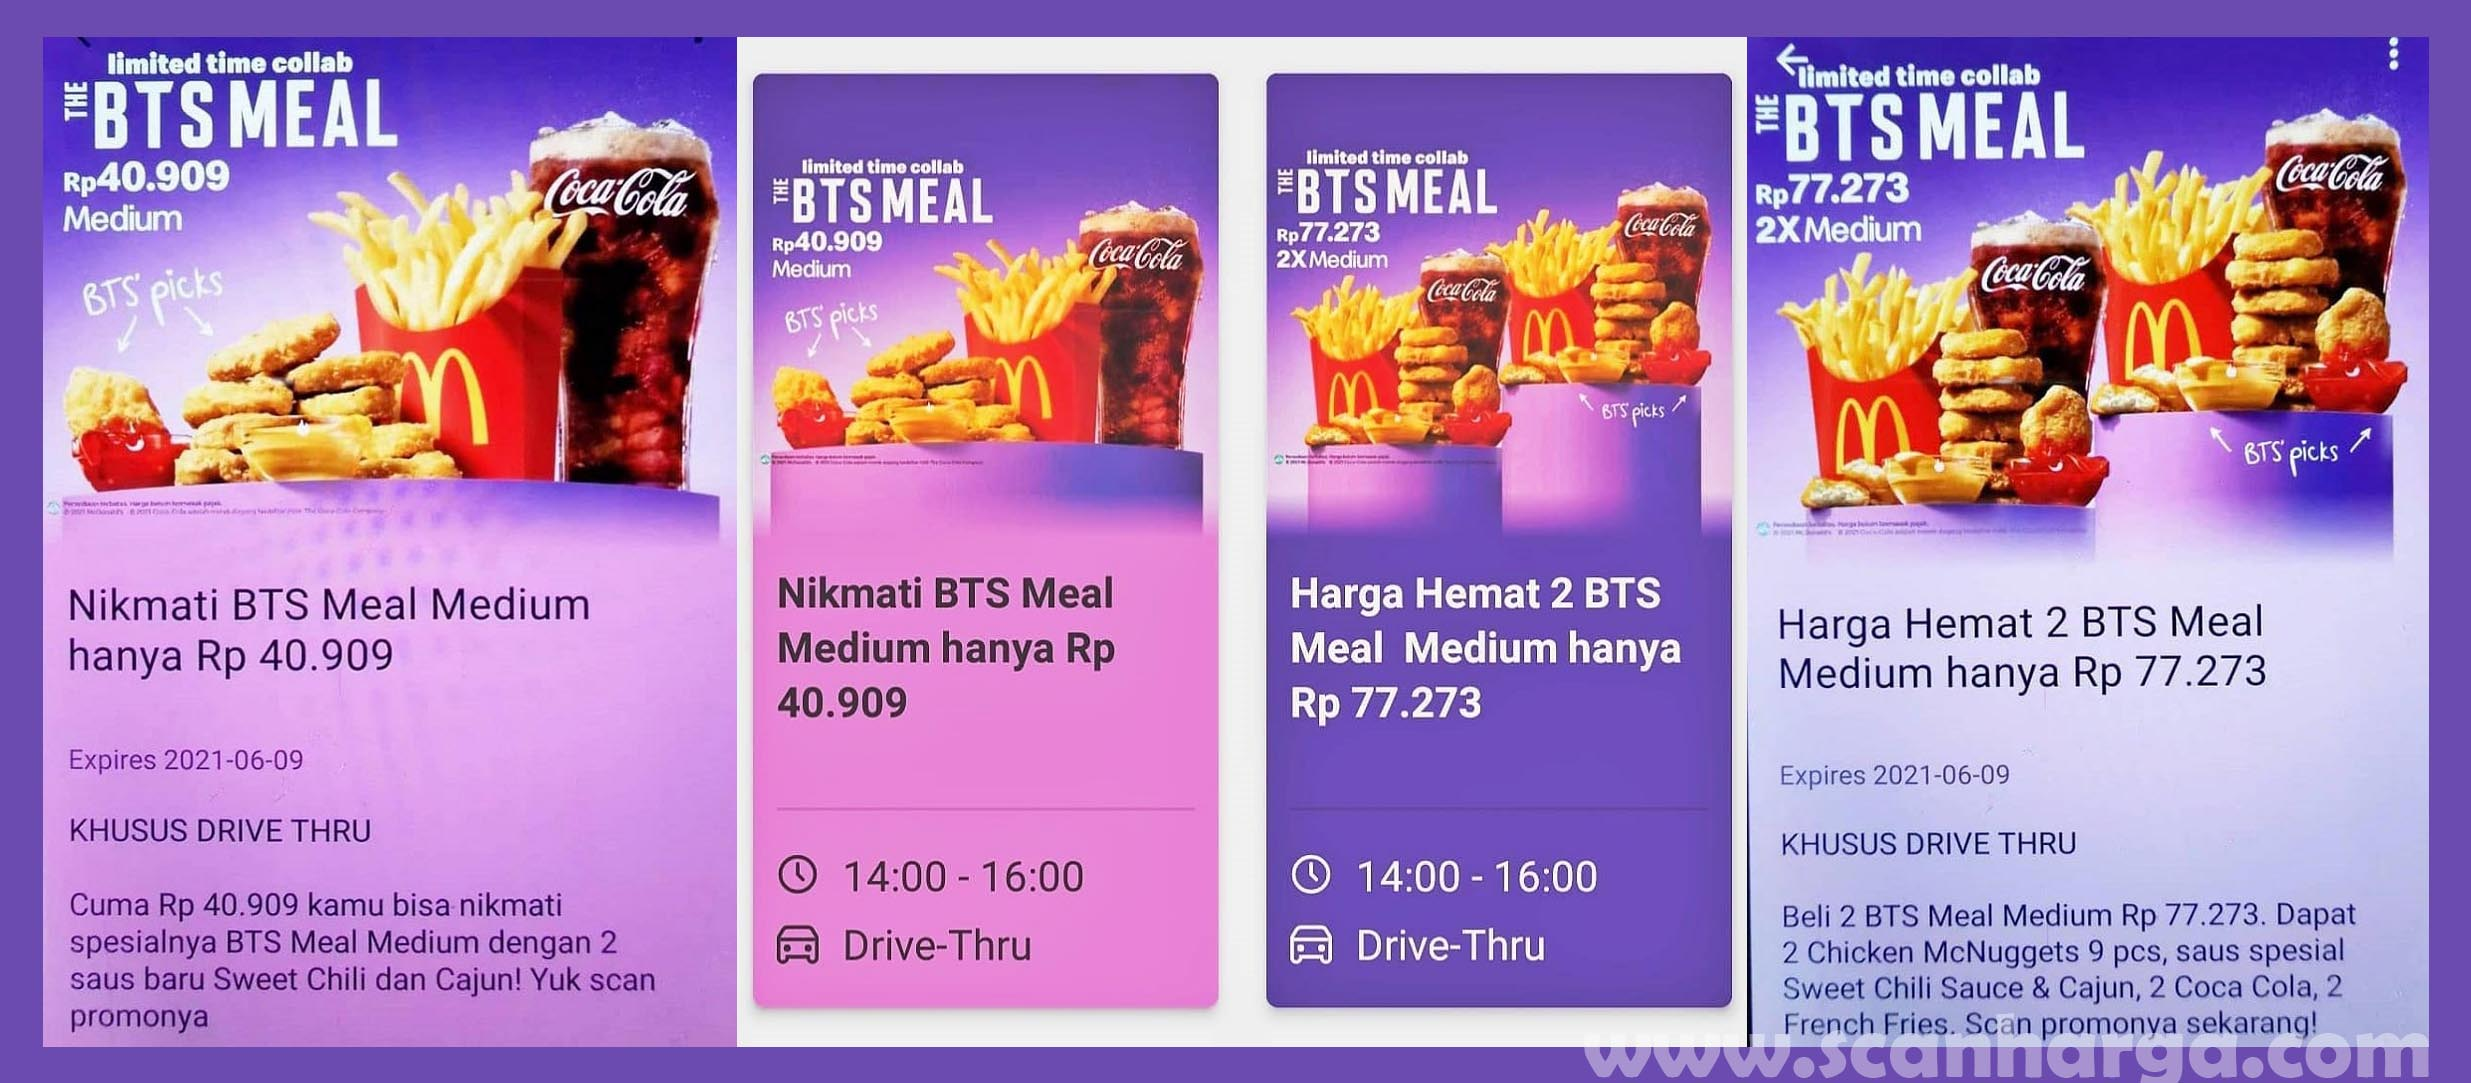 Harga Menu BTS Meal McD Medium Hanya Rp. 40.909